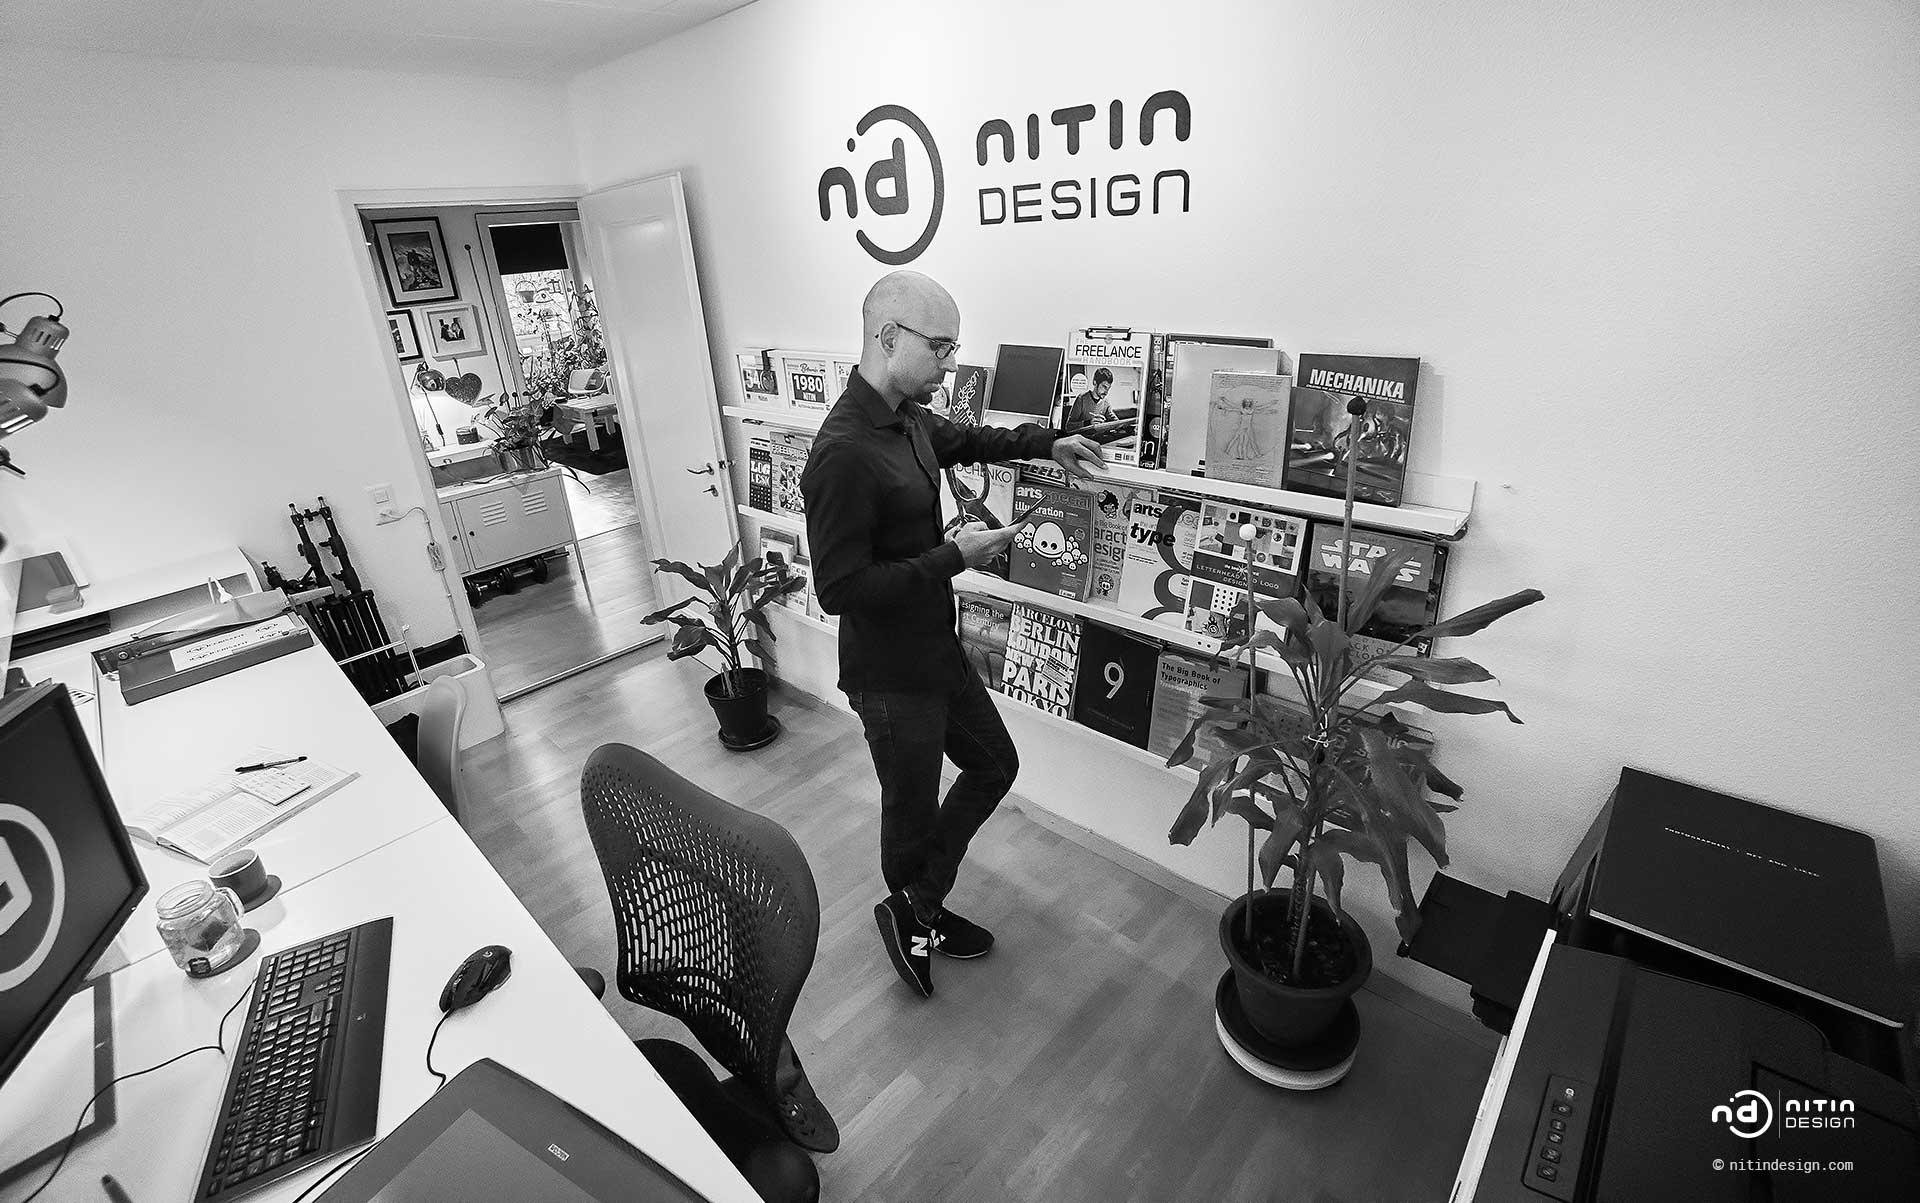 nitin-design-studio